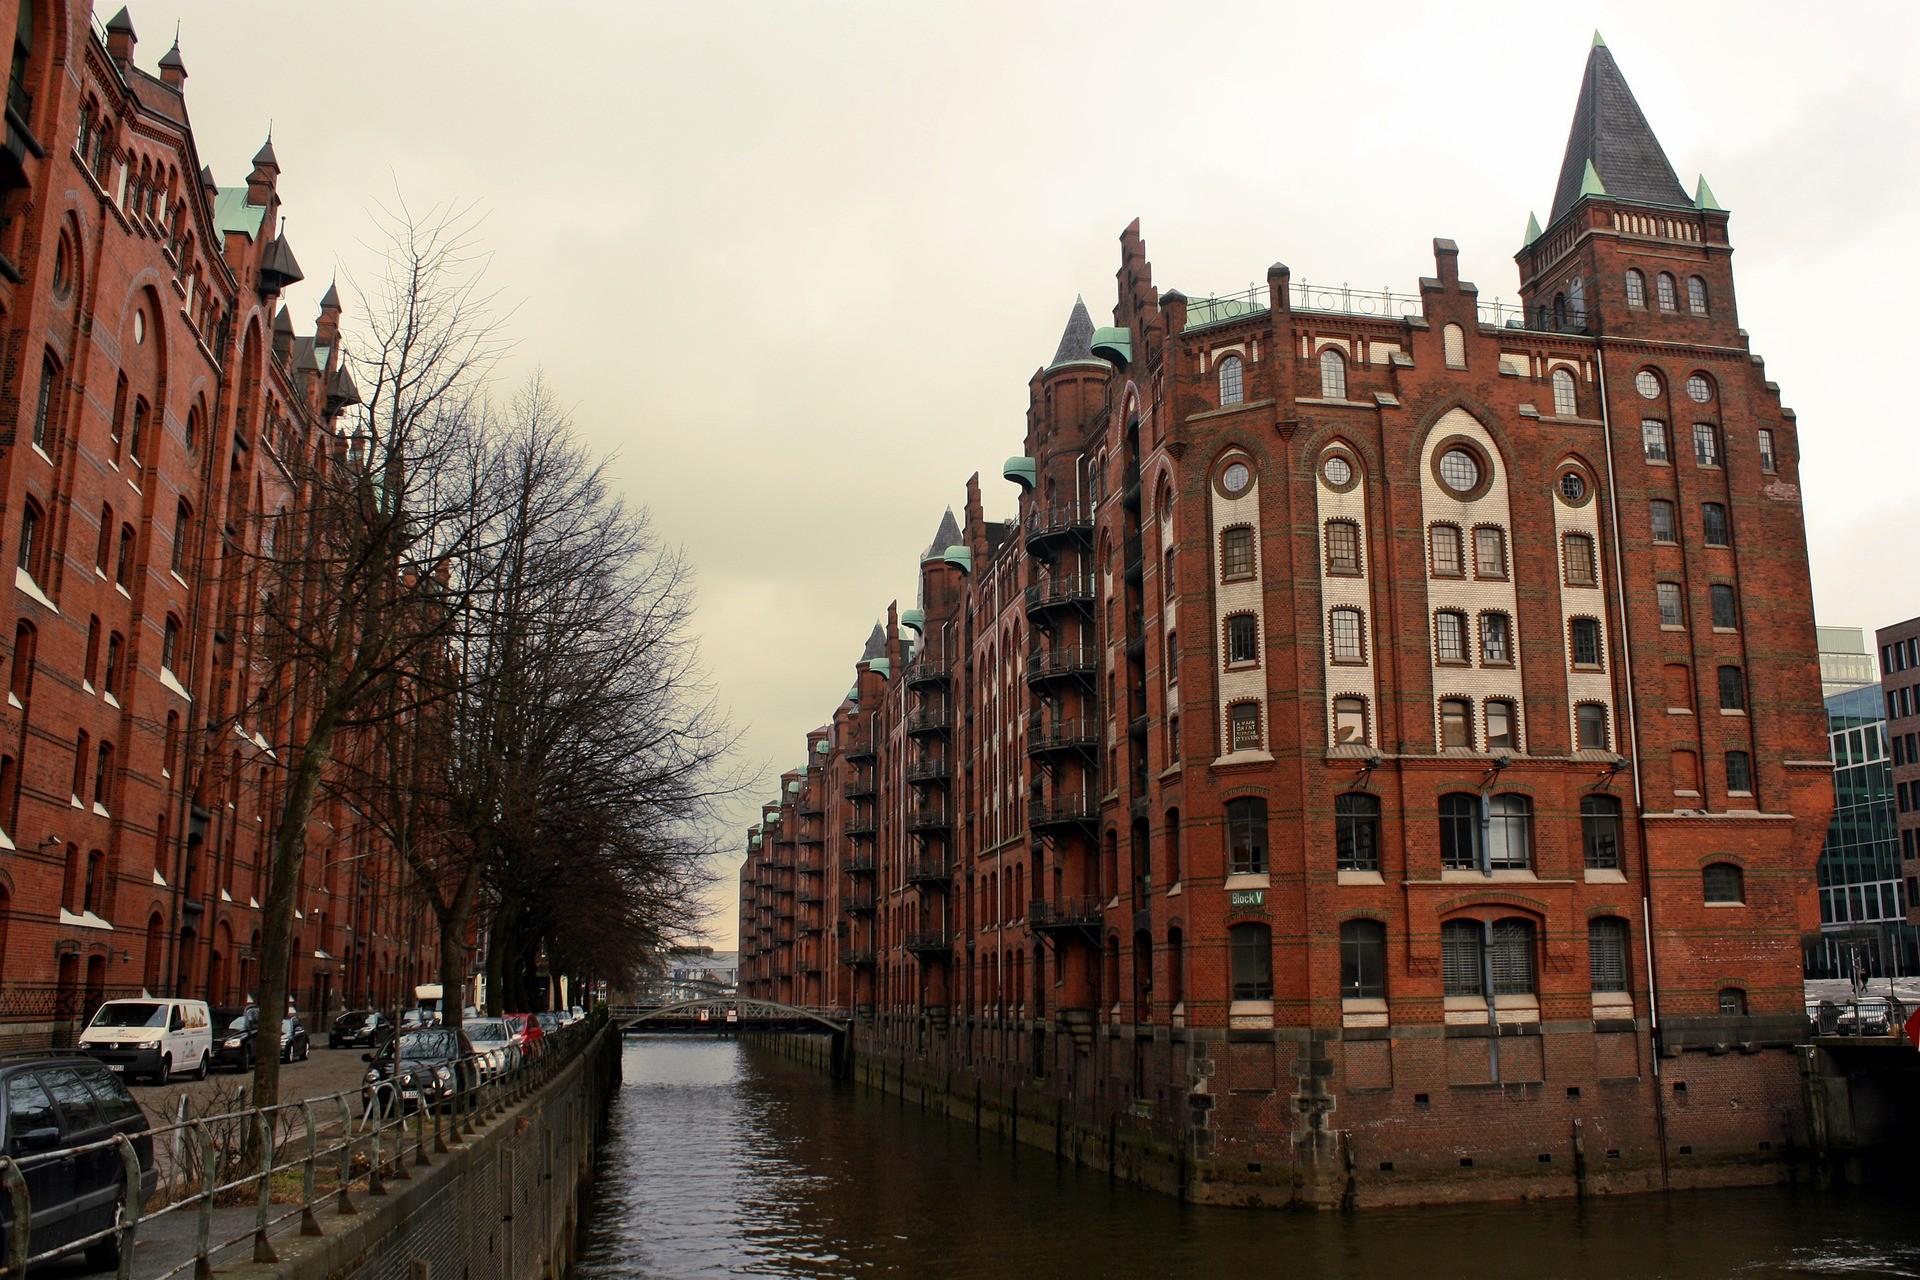 Luoghi di interesse ad Amburgo: Speicherstadt, Amburgo - Foto di Olle August